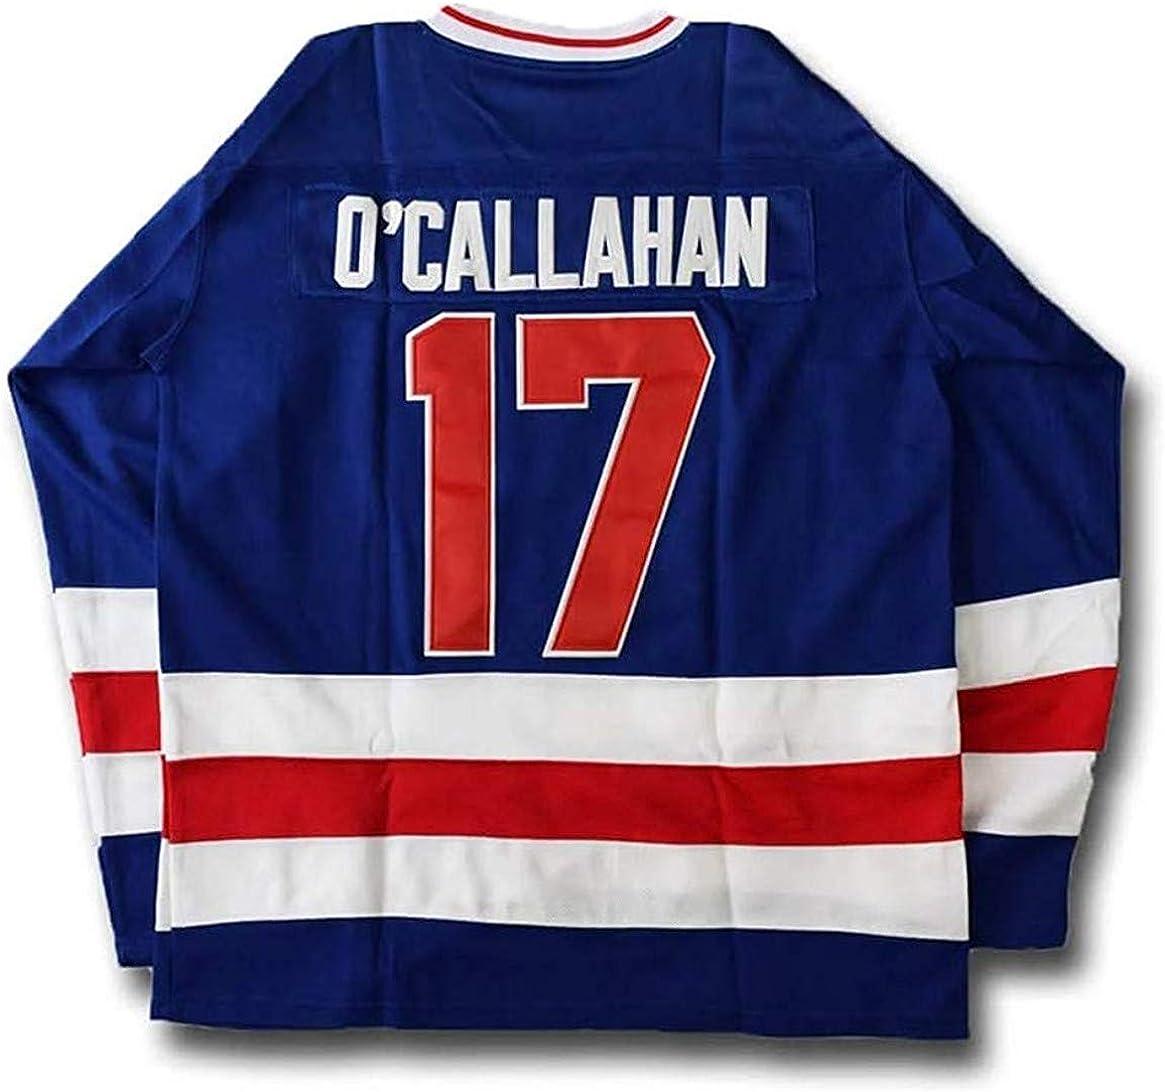 1980 Miracle on Ice Hockey Movie Jersey Jack O'Callahan 17 USA Ice Hockey Jersey Stitched …